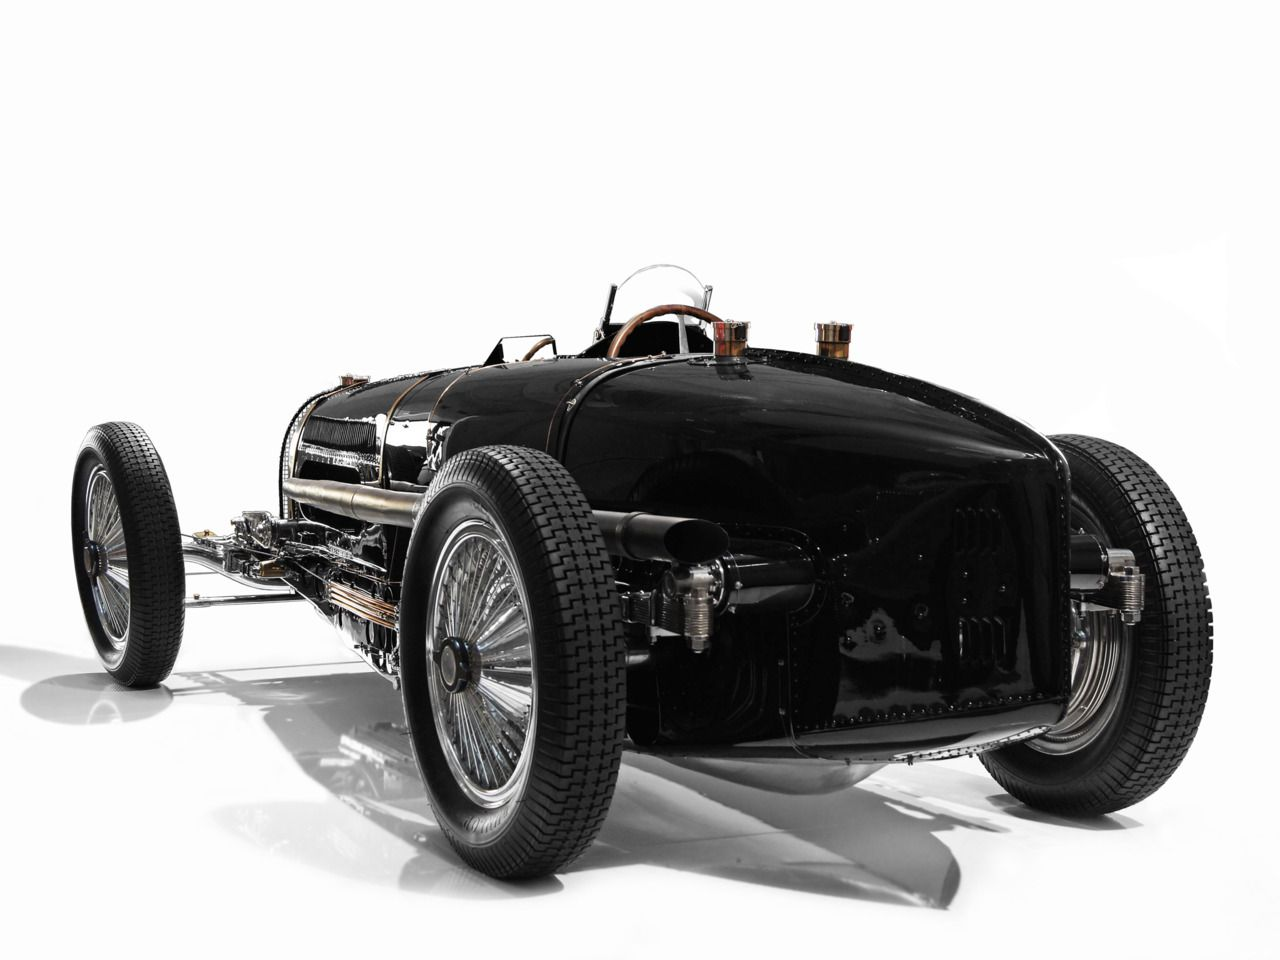 1933 Bugatti Type 59 Grand Prix Racer From The Ralph Lauren Collection Ttnplmo Sf5lkn Bugatti Type 59 Grand Prix 193 Bugatti Bugatti Cars Bugatti Wallpapers